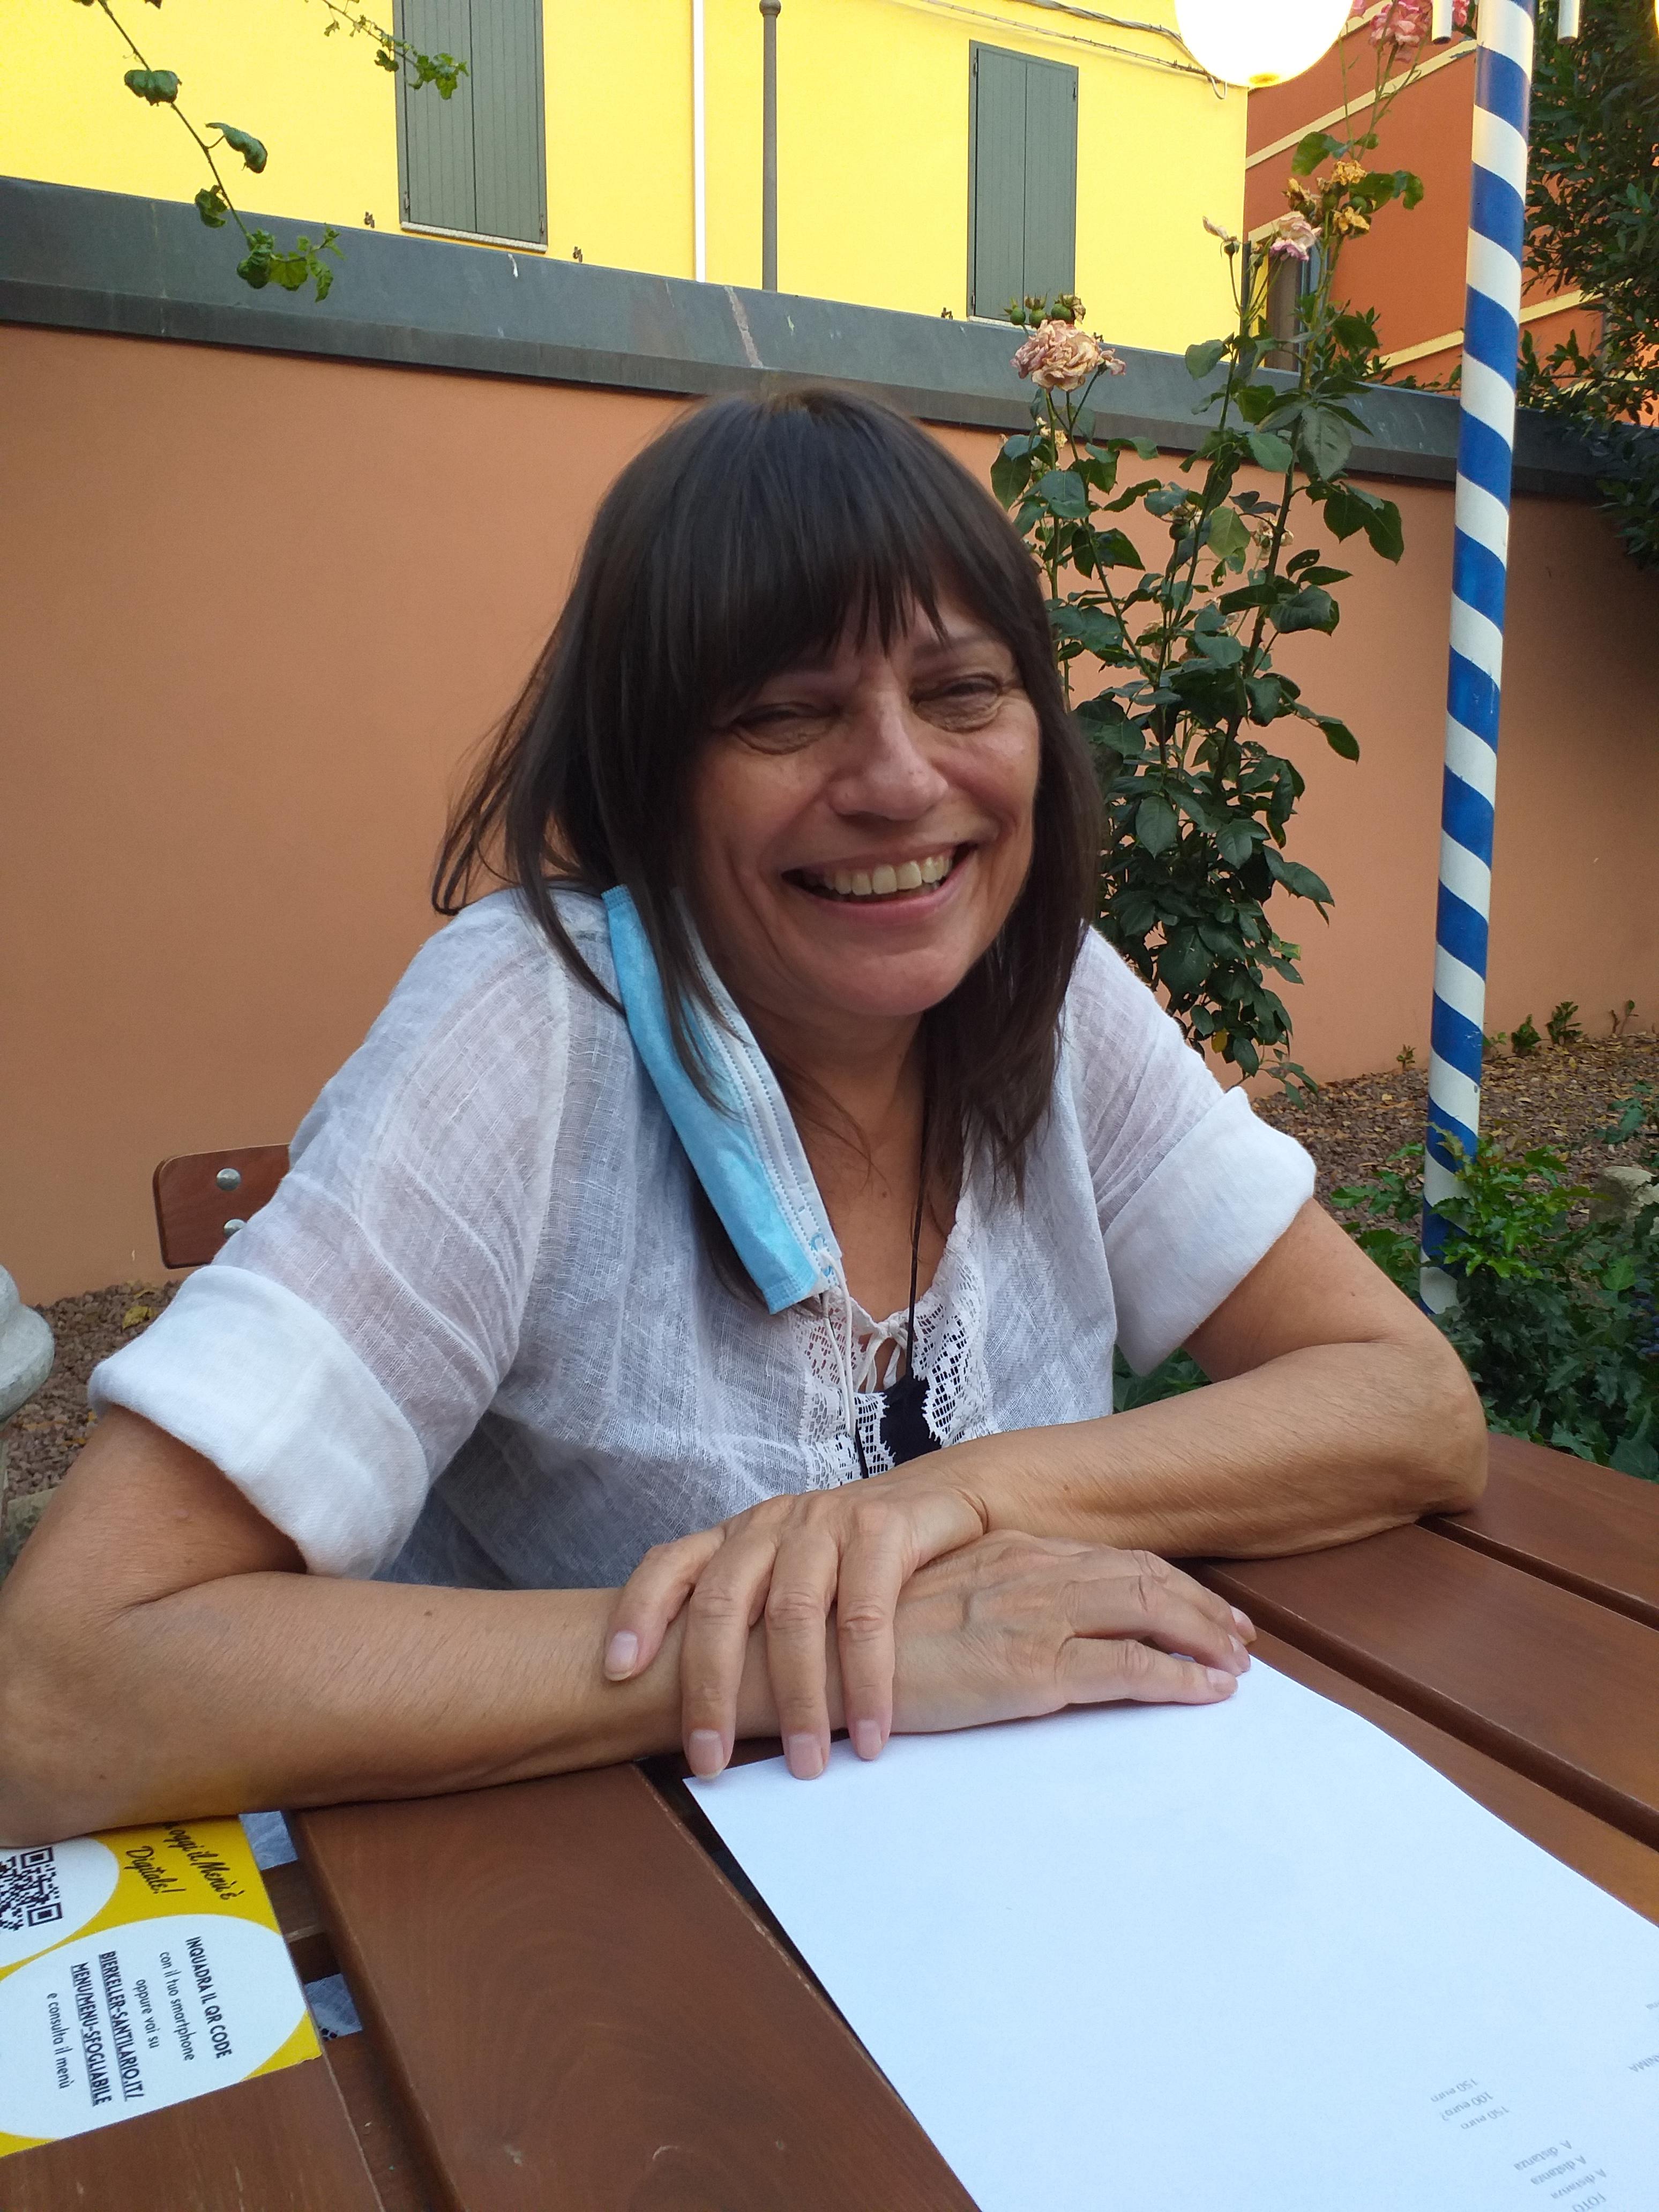 Patrizia Elena Capodicasa